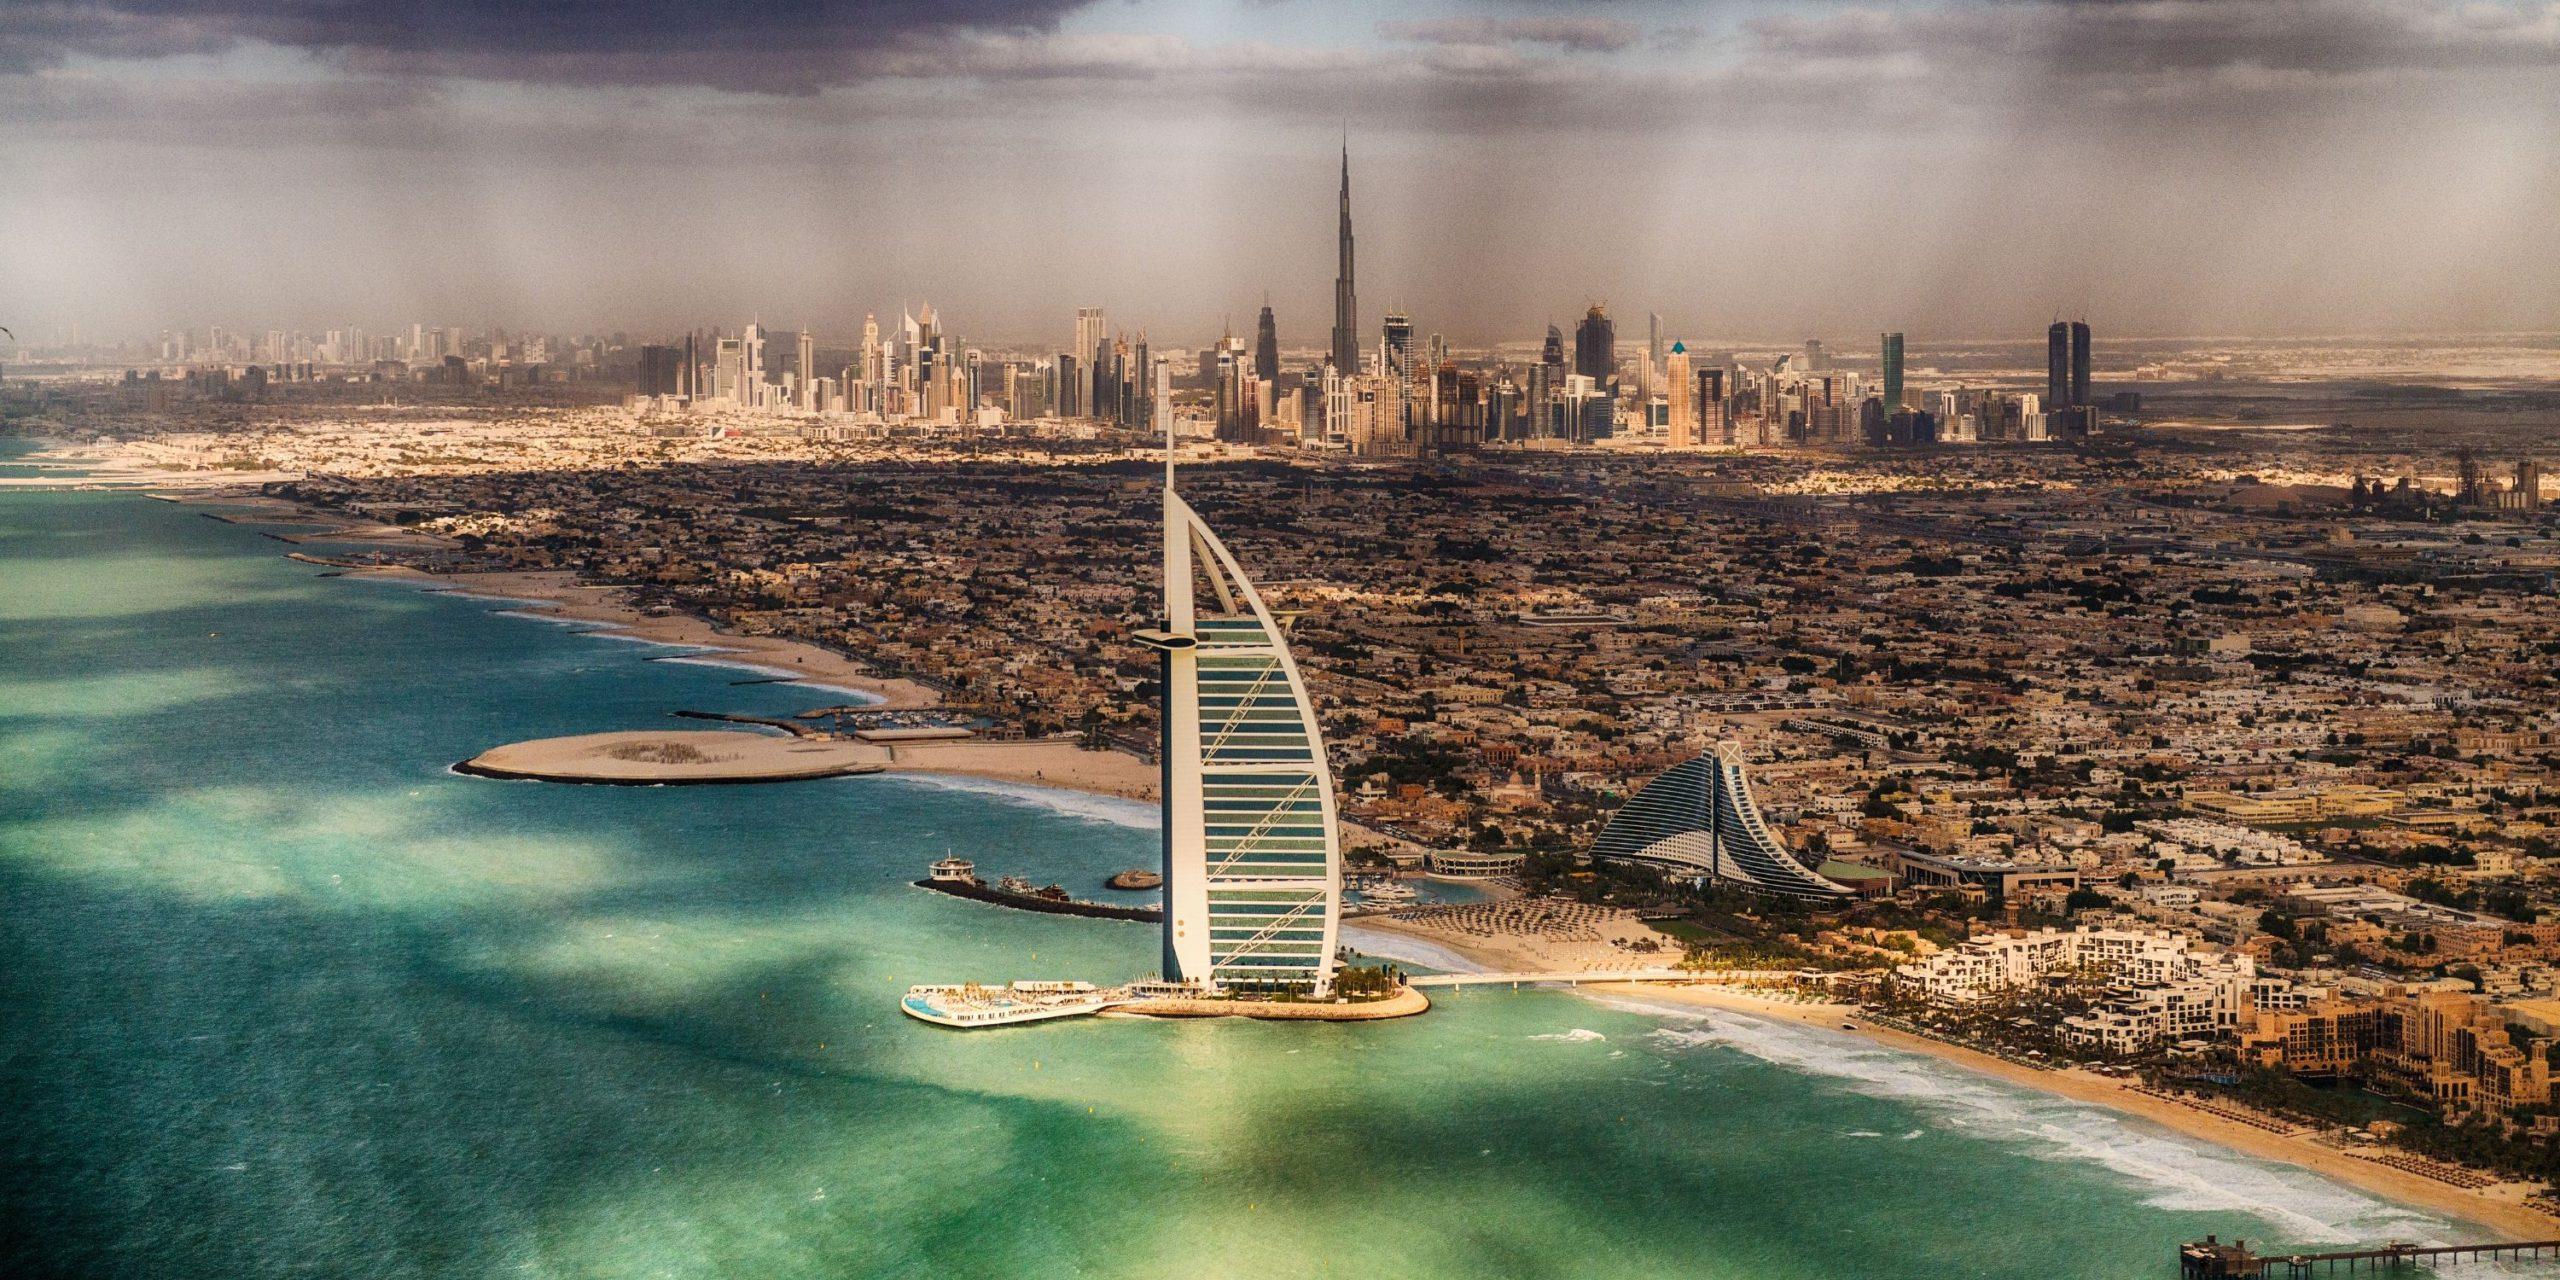 Гостевое разрешение на въезд в ОАЭ